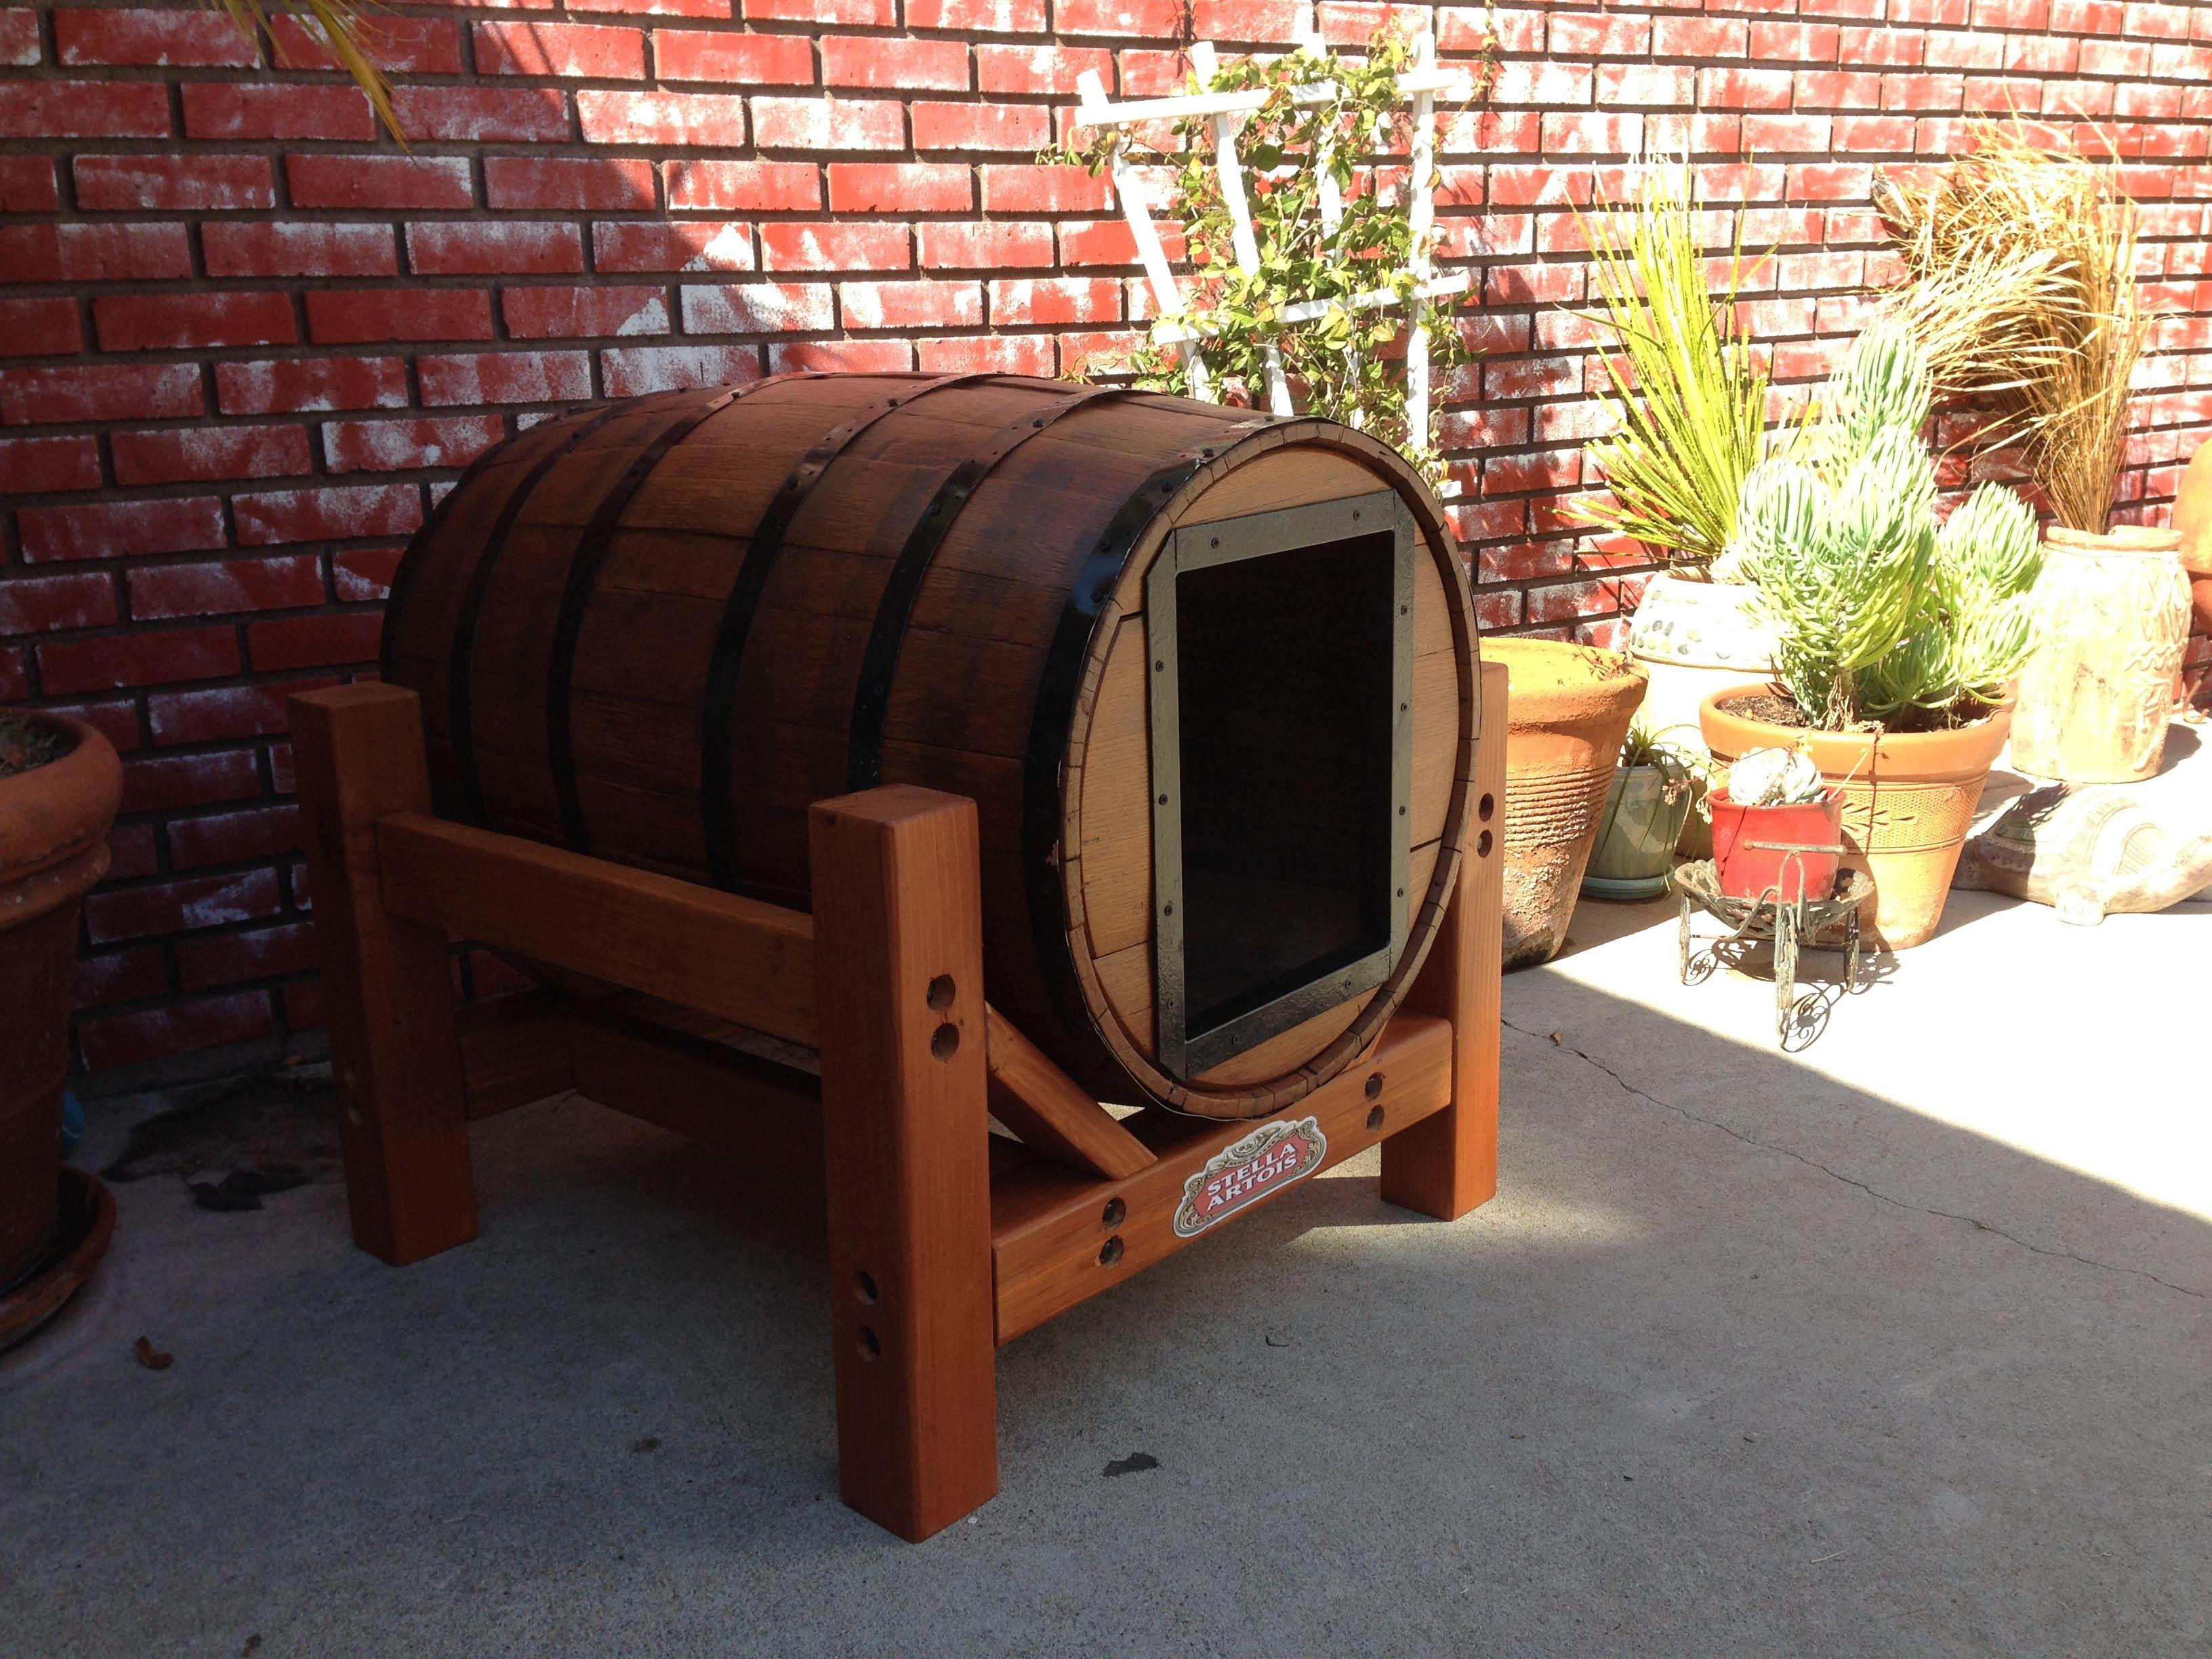 Whiskey Barrel Dog House #Minwax #IDidThatSweepstakes | #Minwax #IDidThatSweepstakes | Pinterest ...